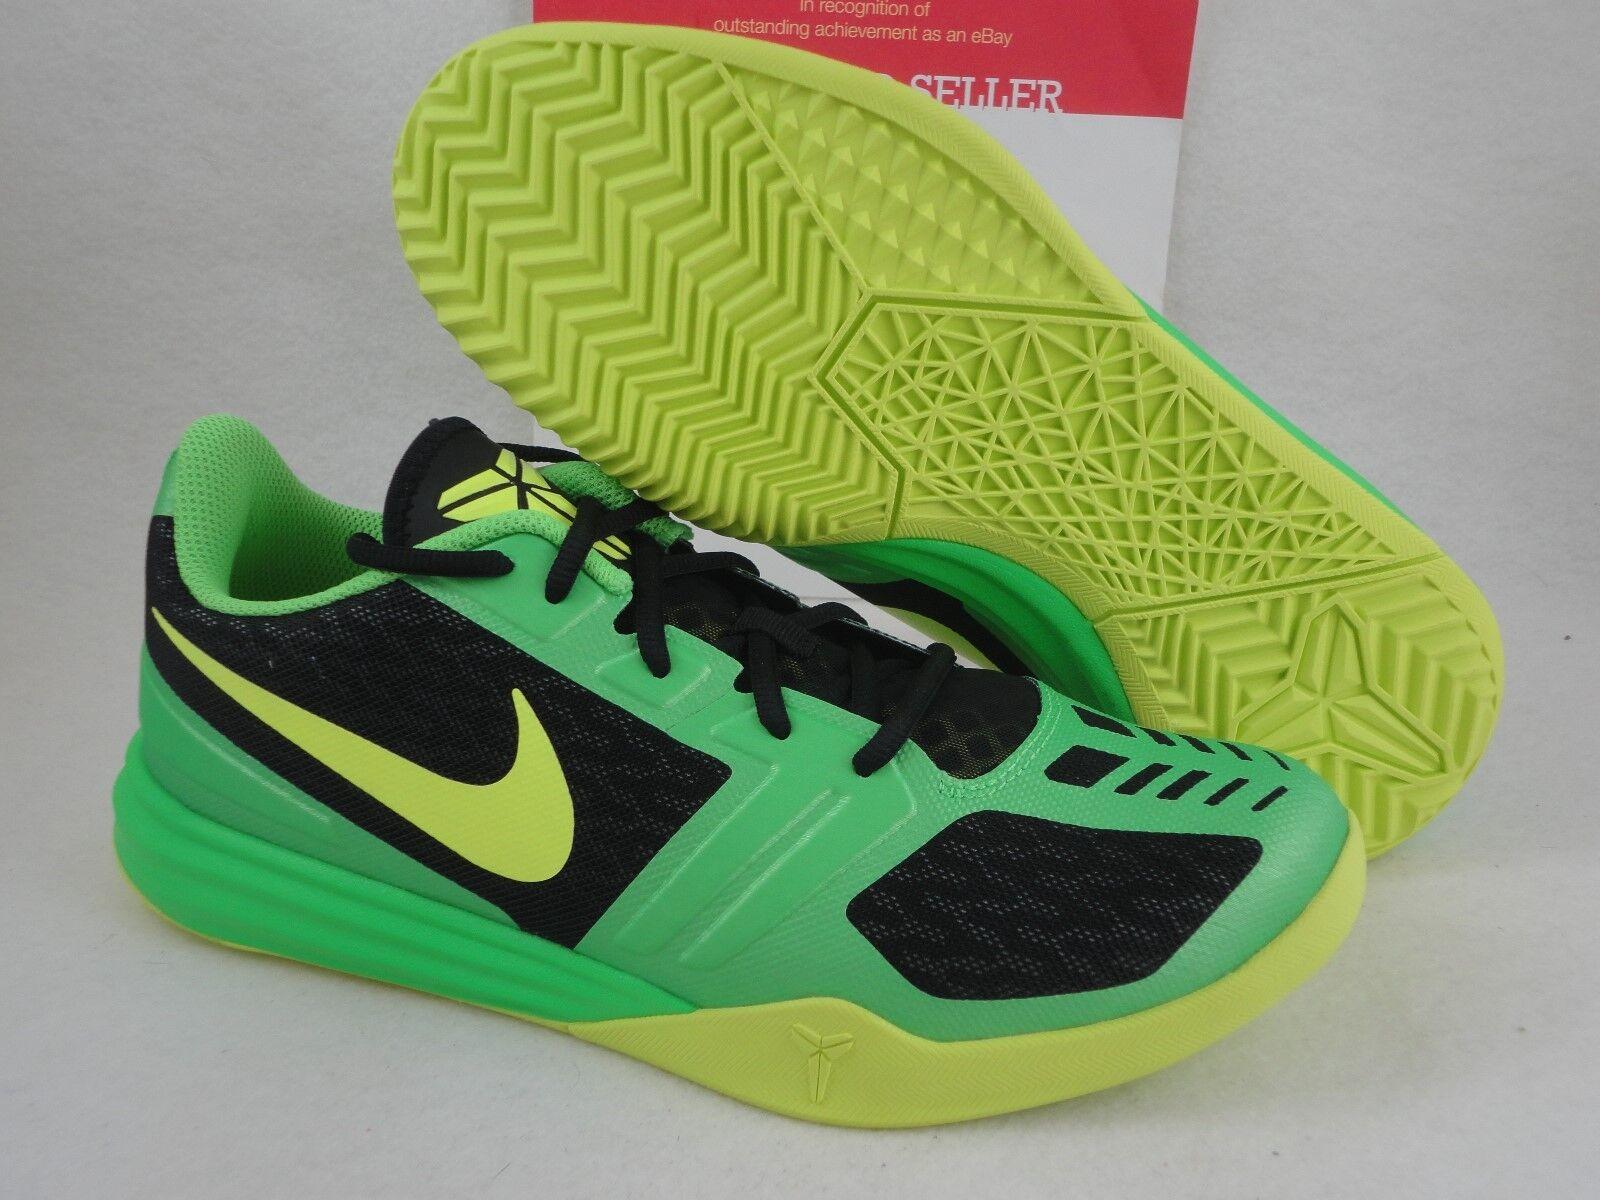 quality design 07d06 64e08 купить nike kobe black white, с доставкой Nike KB Mentality Black   Volt    Poison